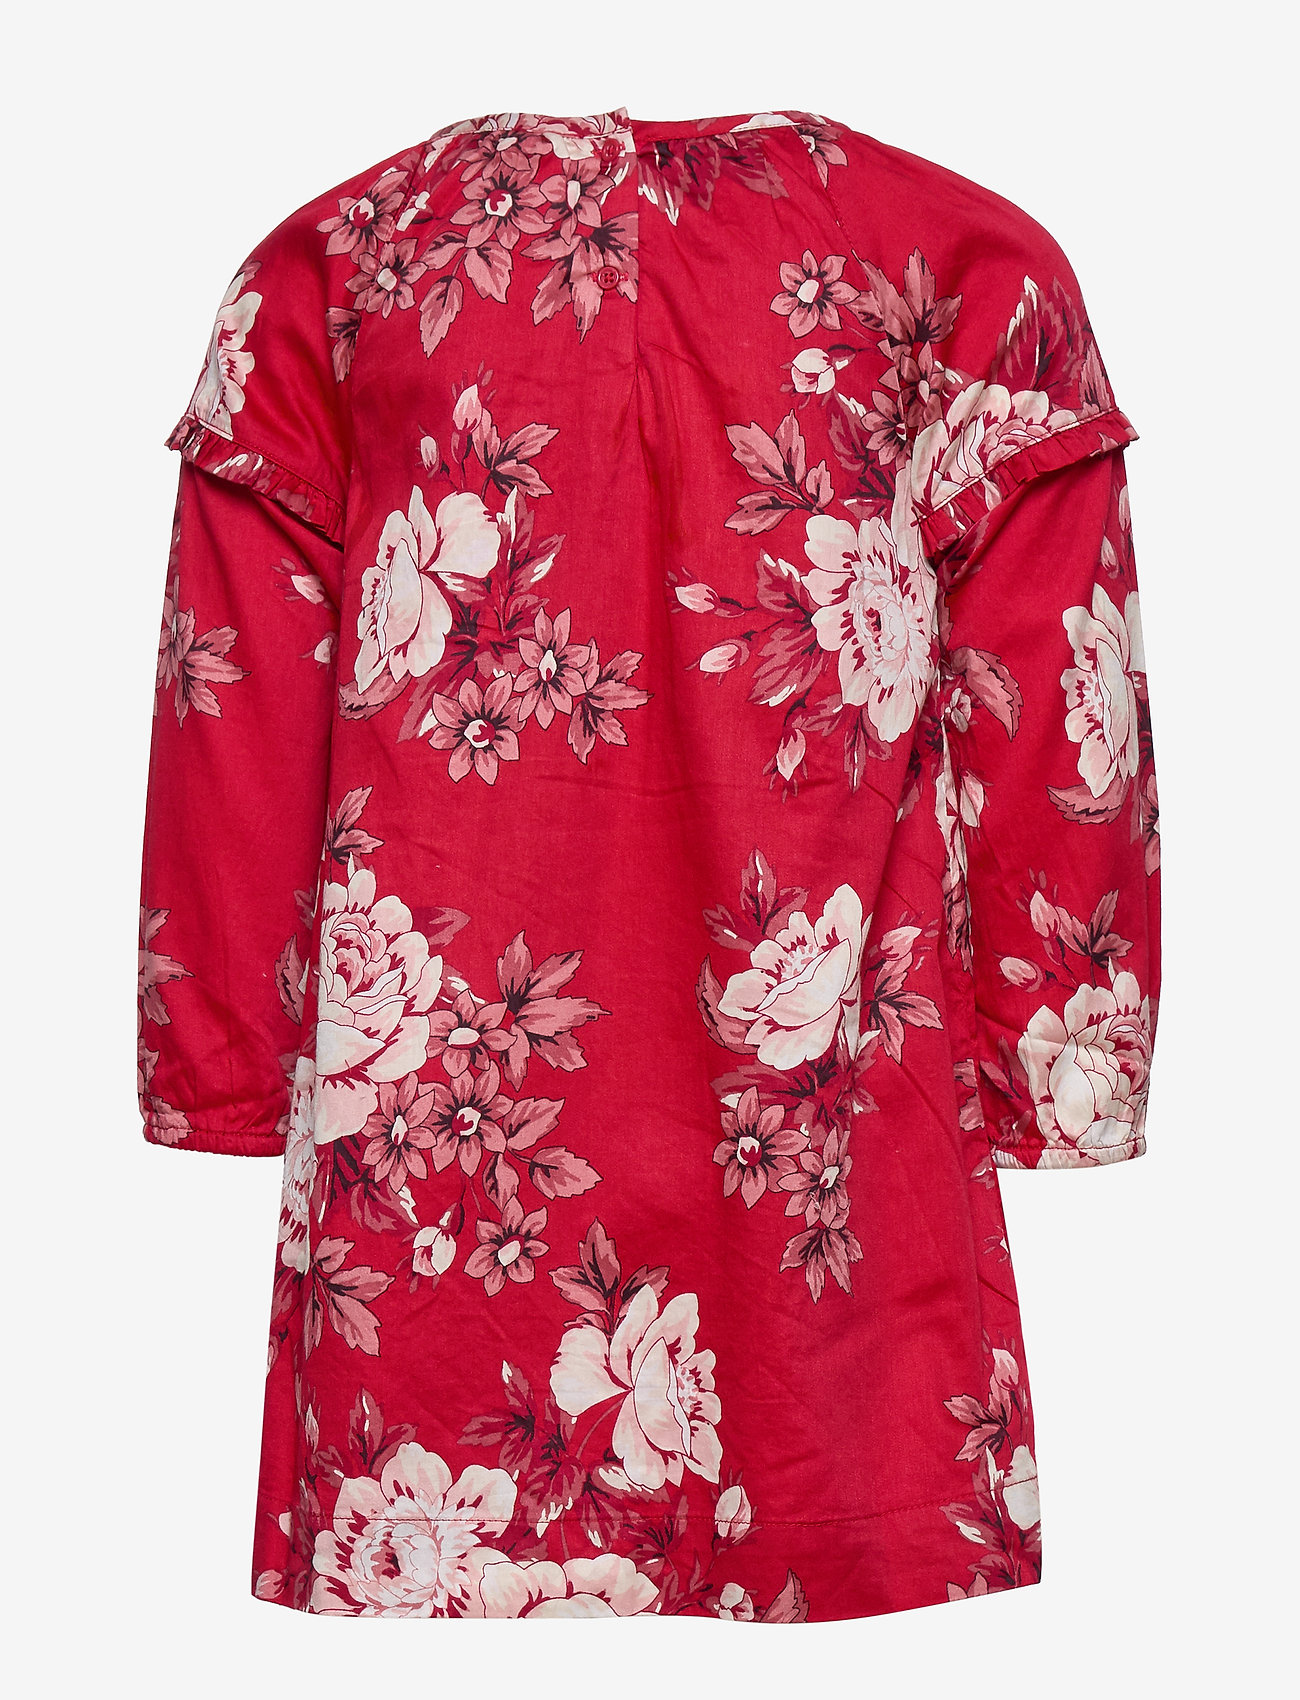 Toddler Floral Ruffle Dress (Red Floral Print) (26.40 €) - GAP Ari6T